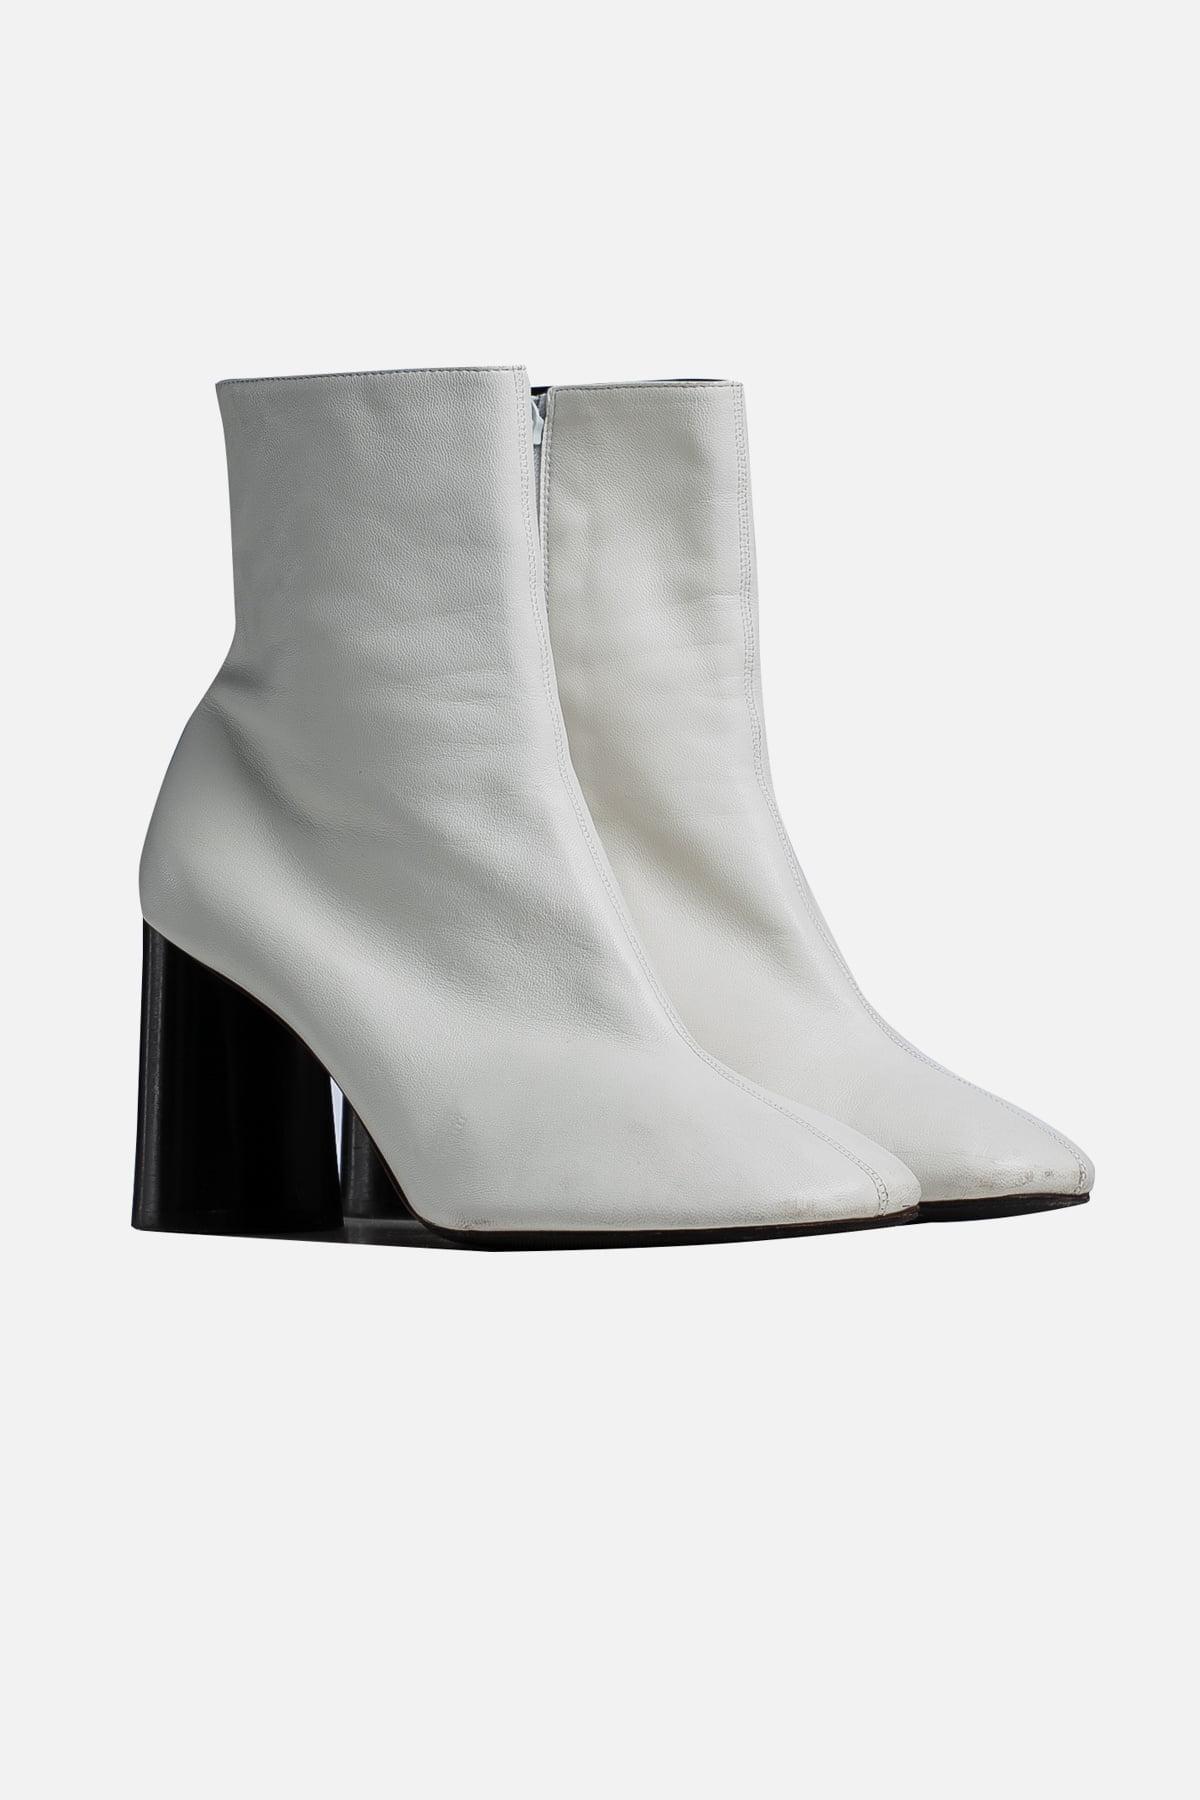 Elliptic Leather Boots